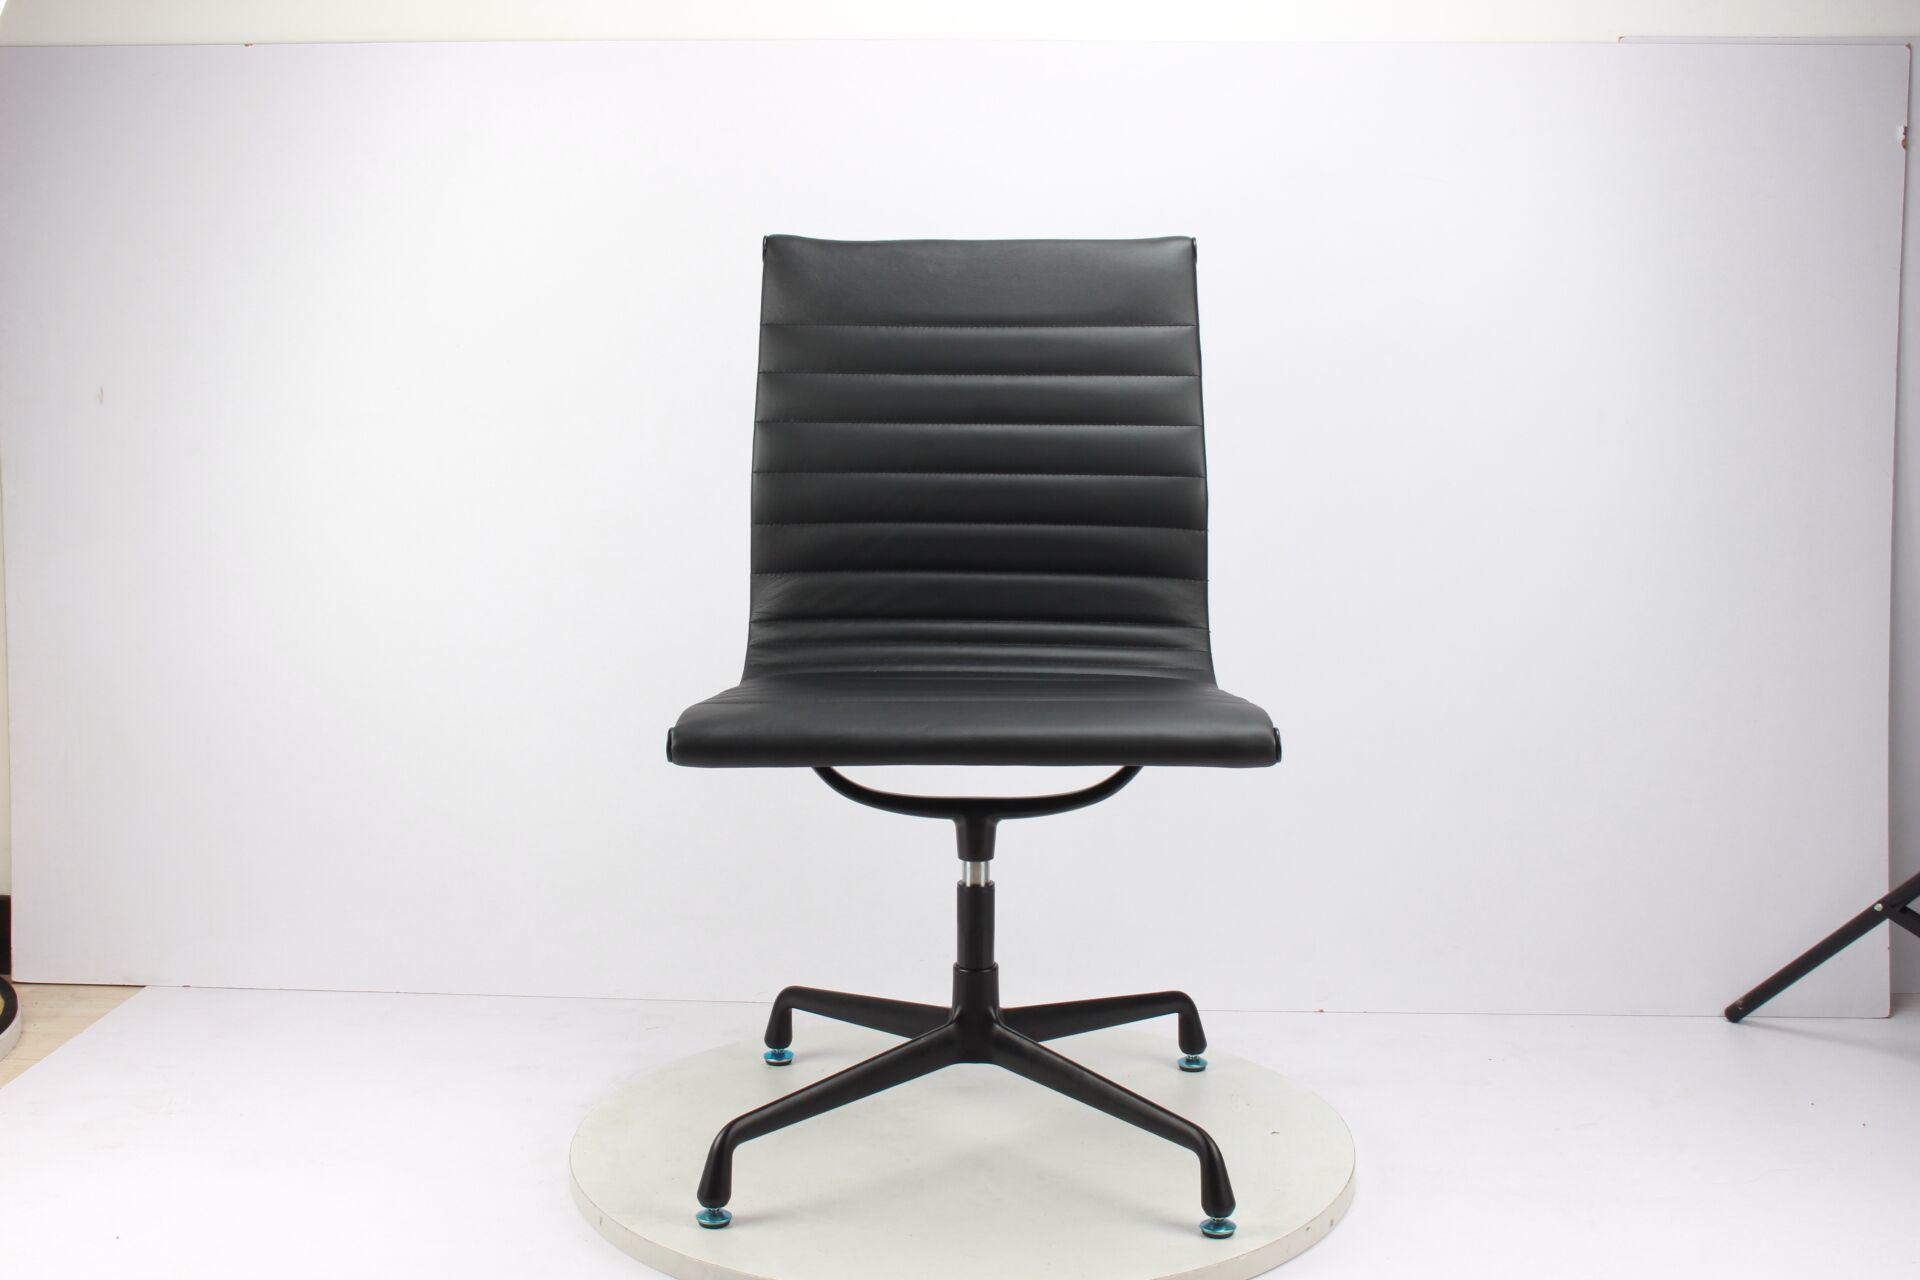 Factory Armless Office Chair